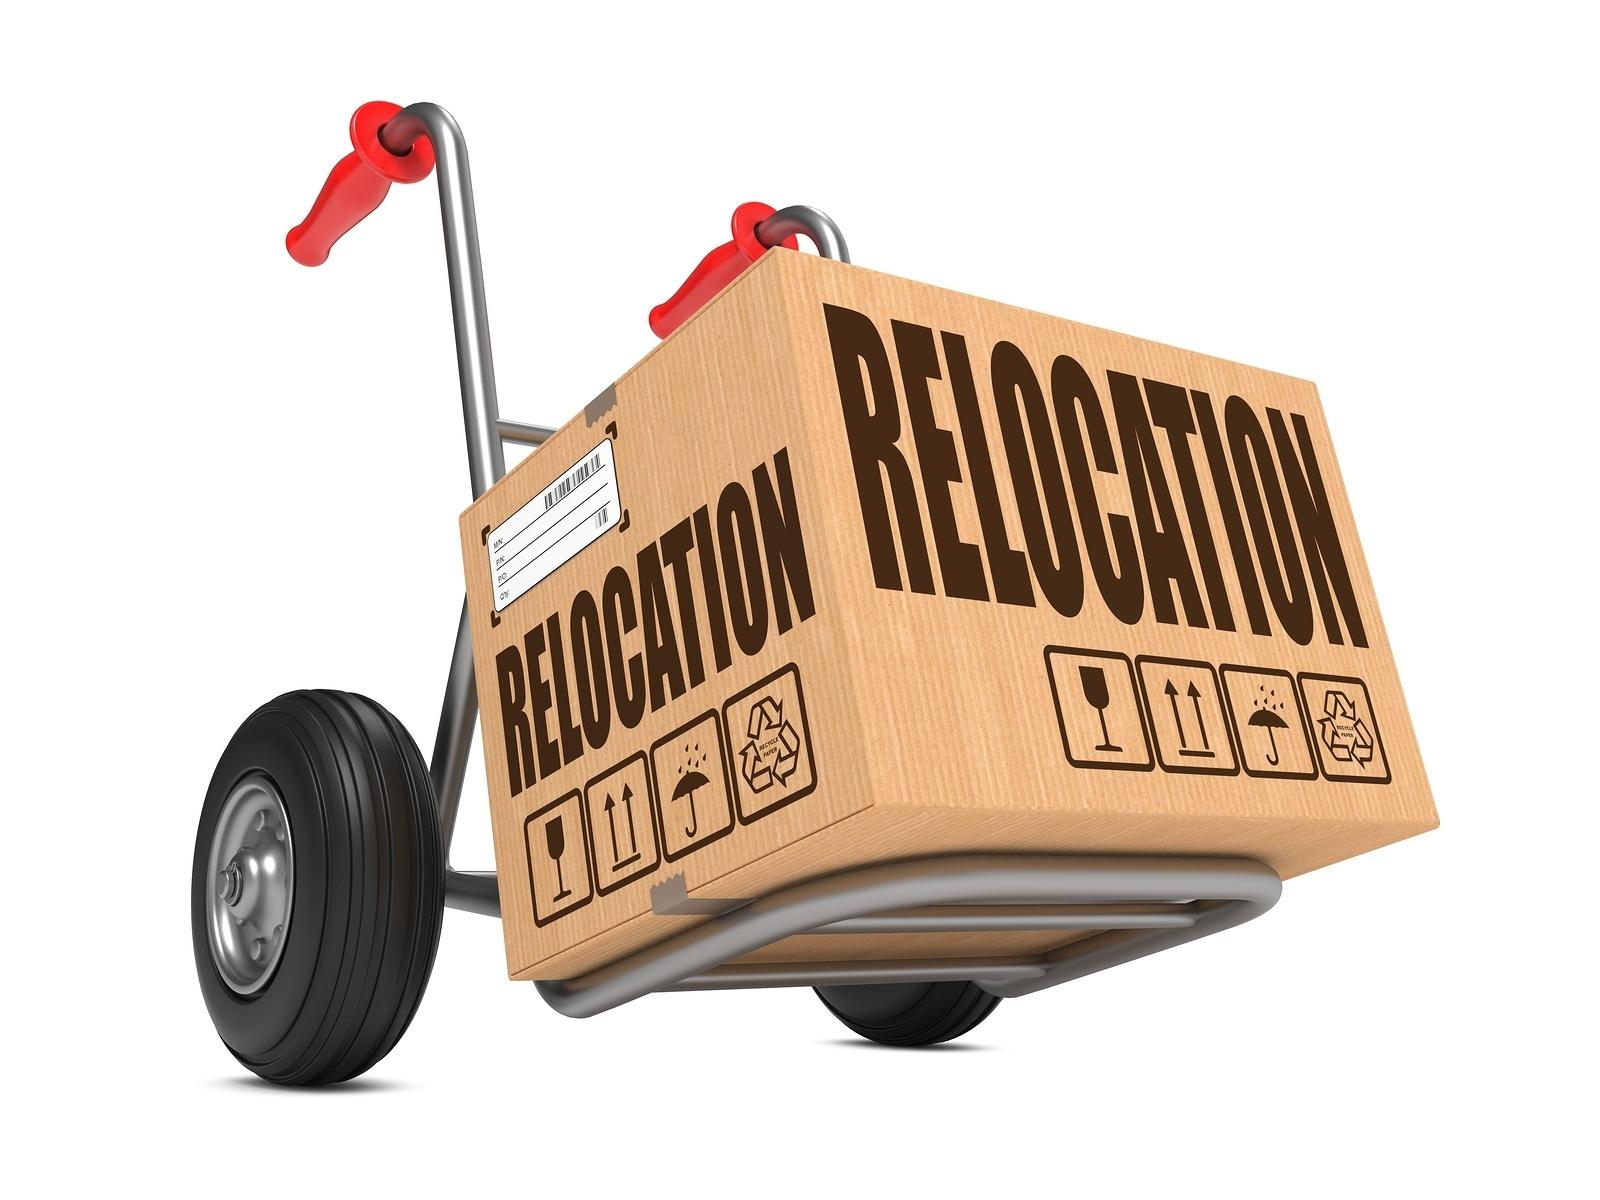 relocation-cardboard-box.jpg